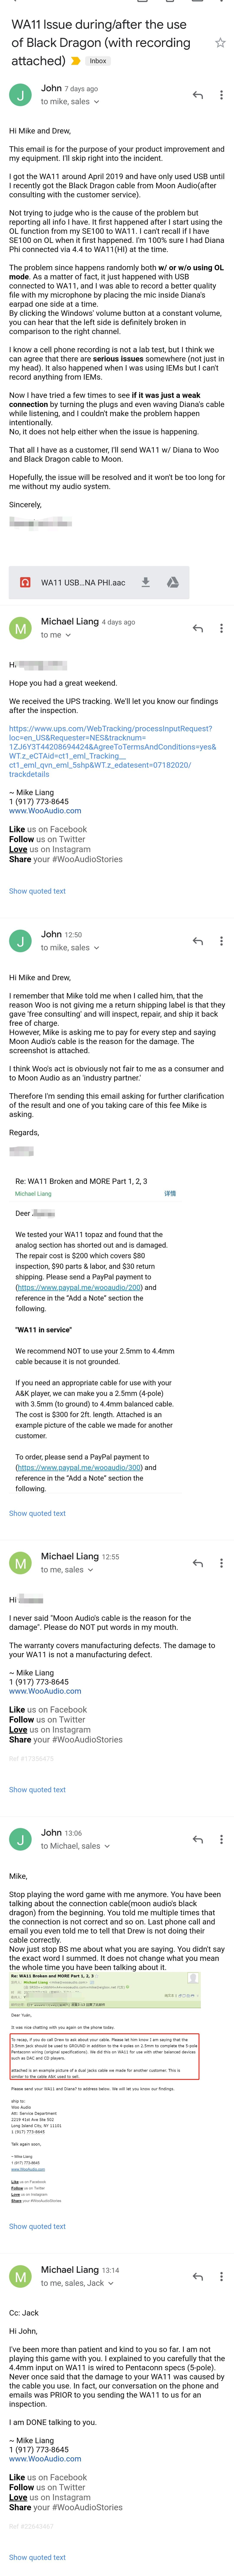 moon woo in email chain.jpg